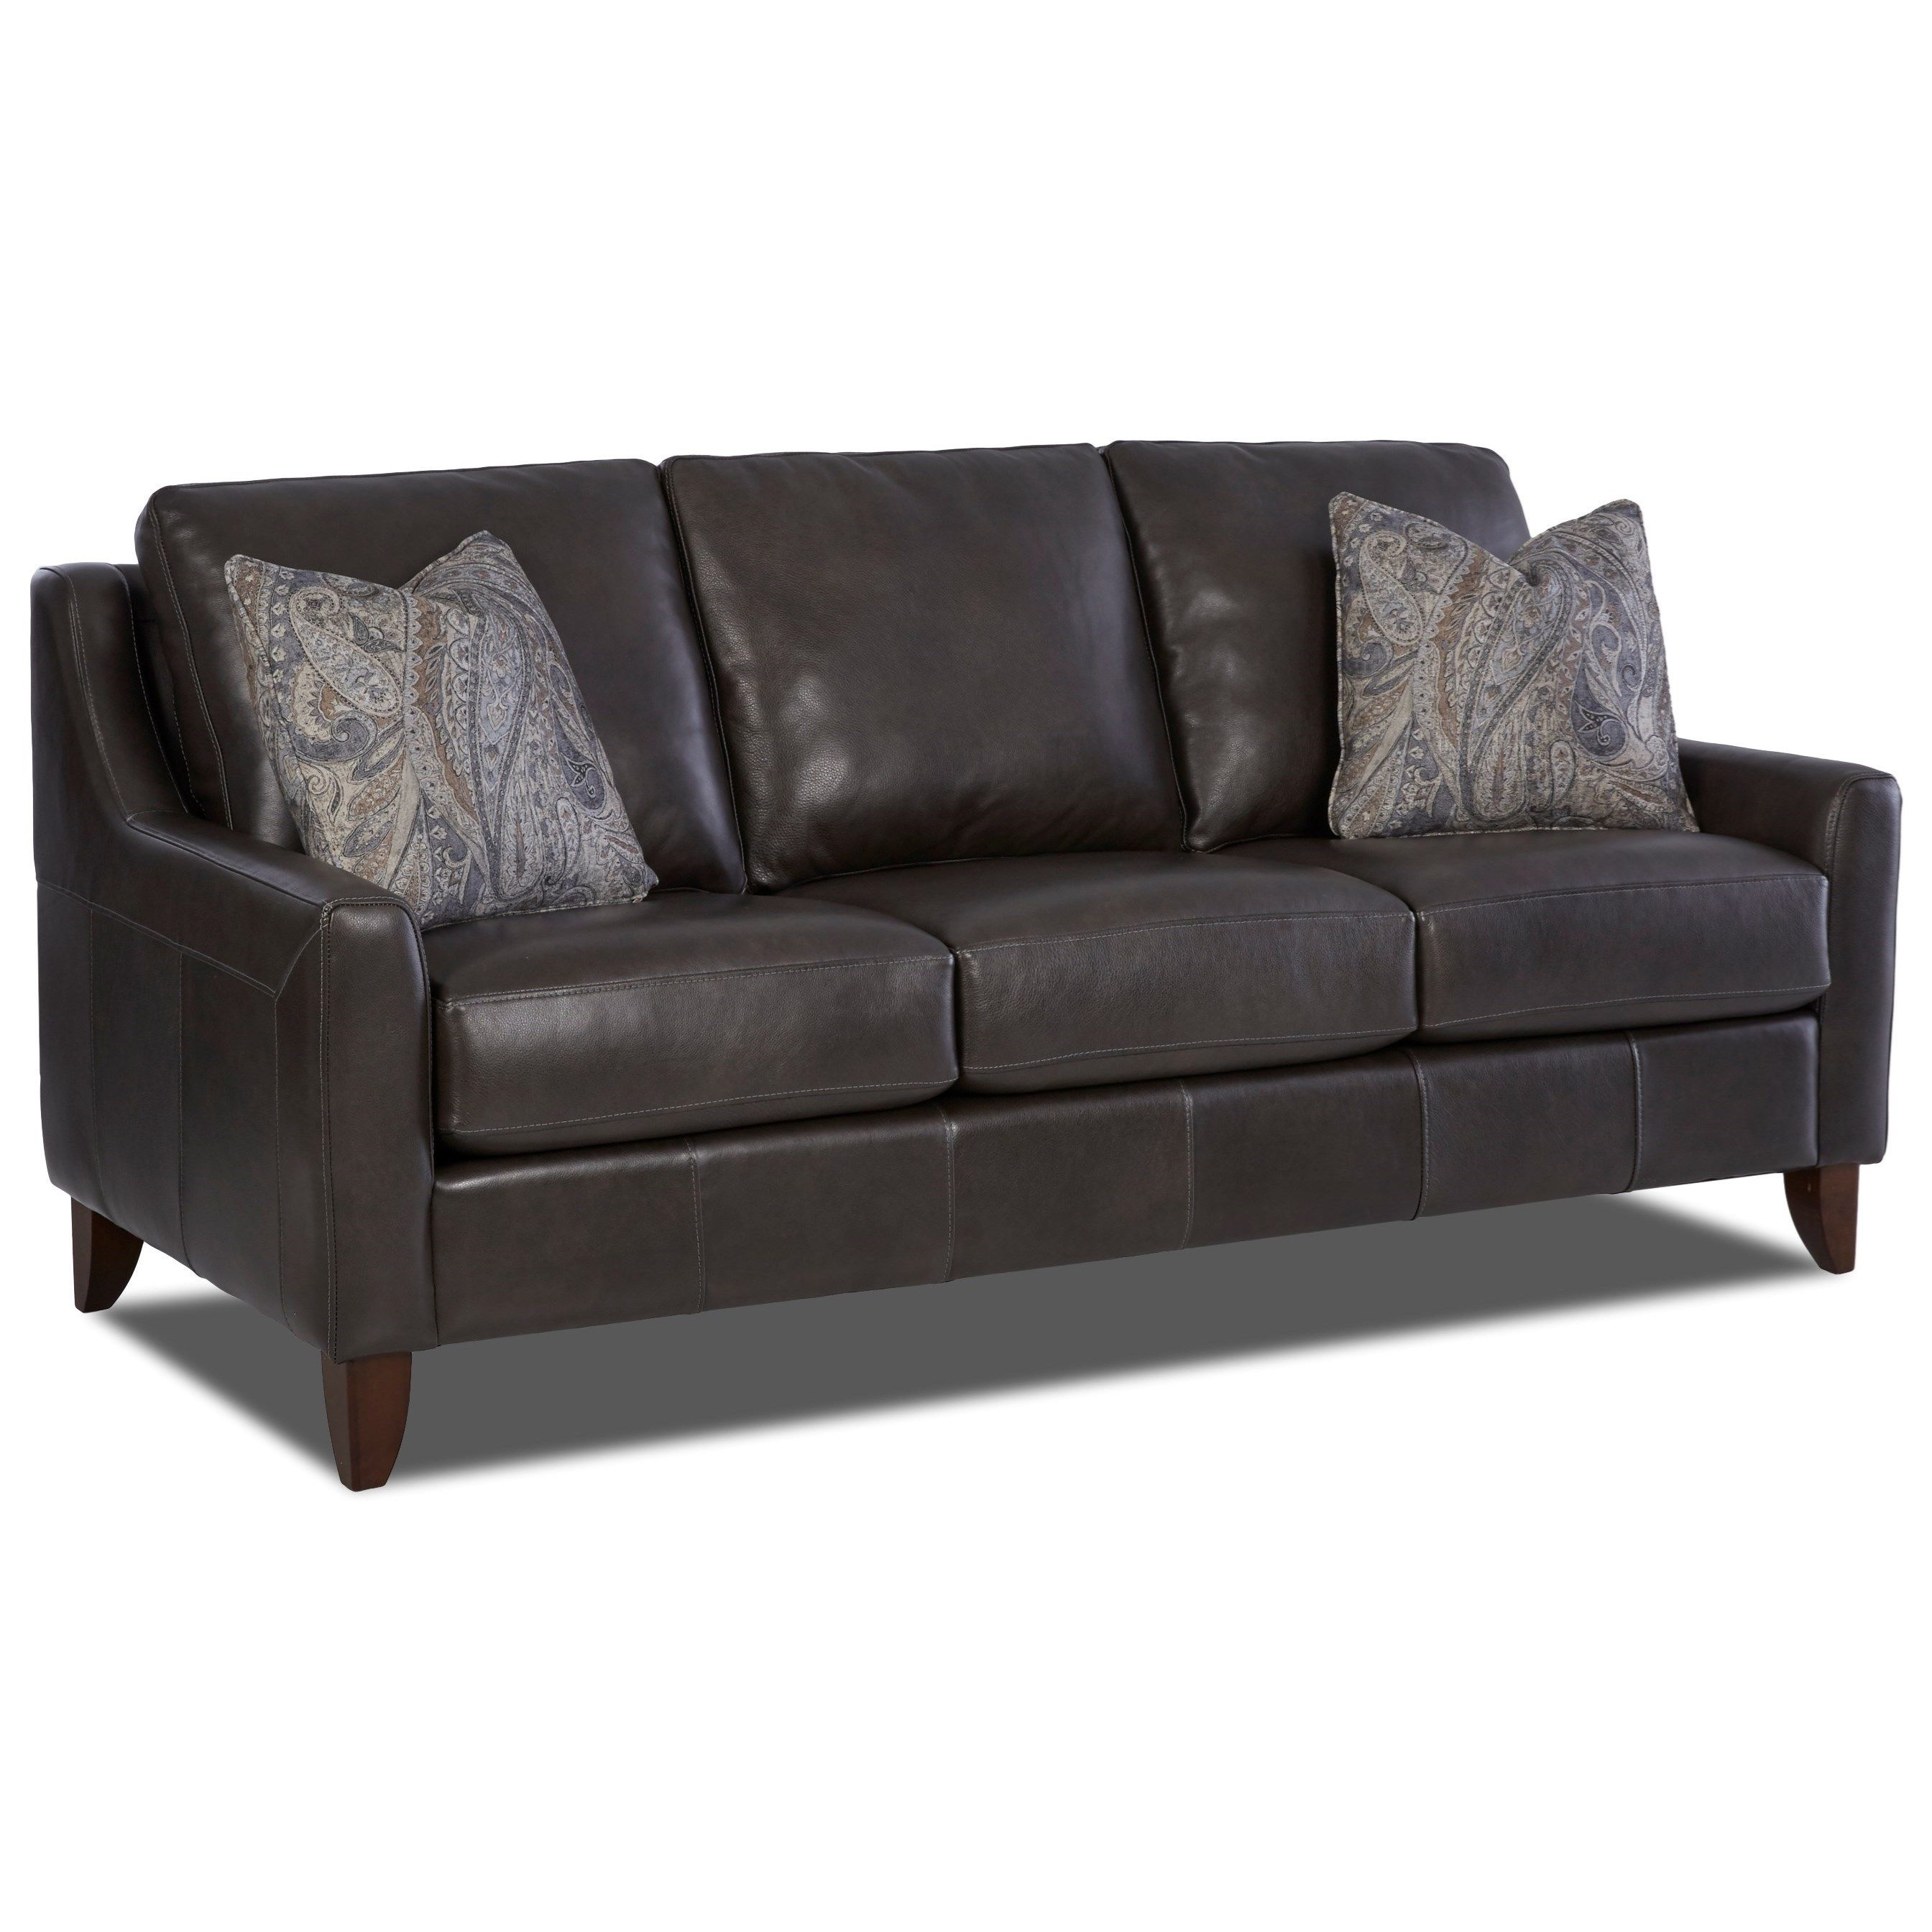 belton belton leather sofa w pillows by klaussner model home rh pinterest com